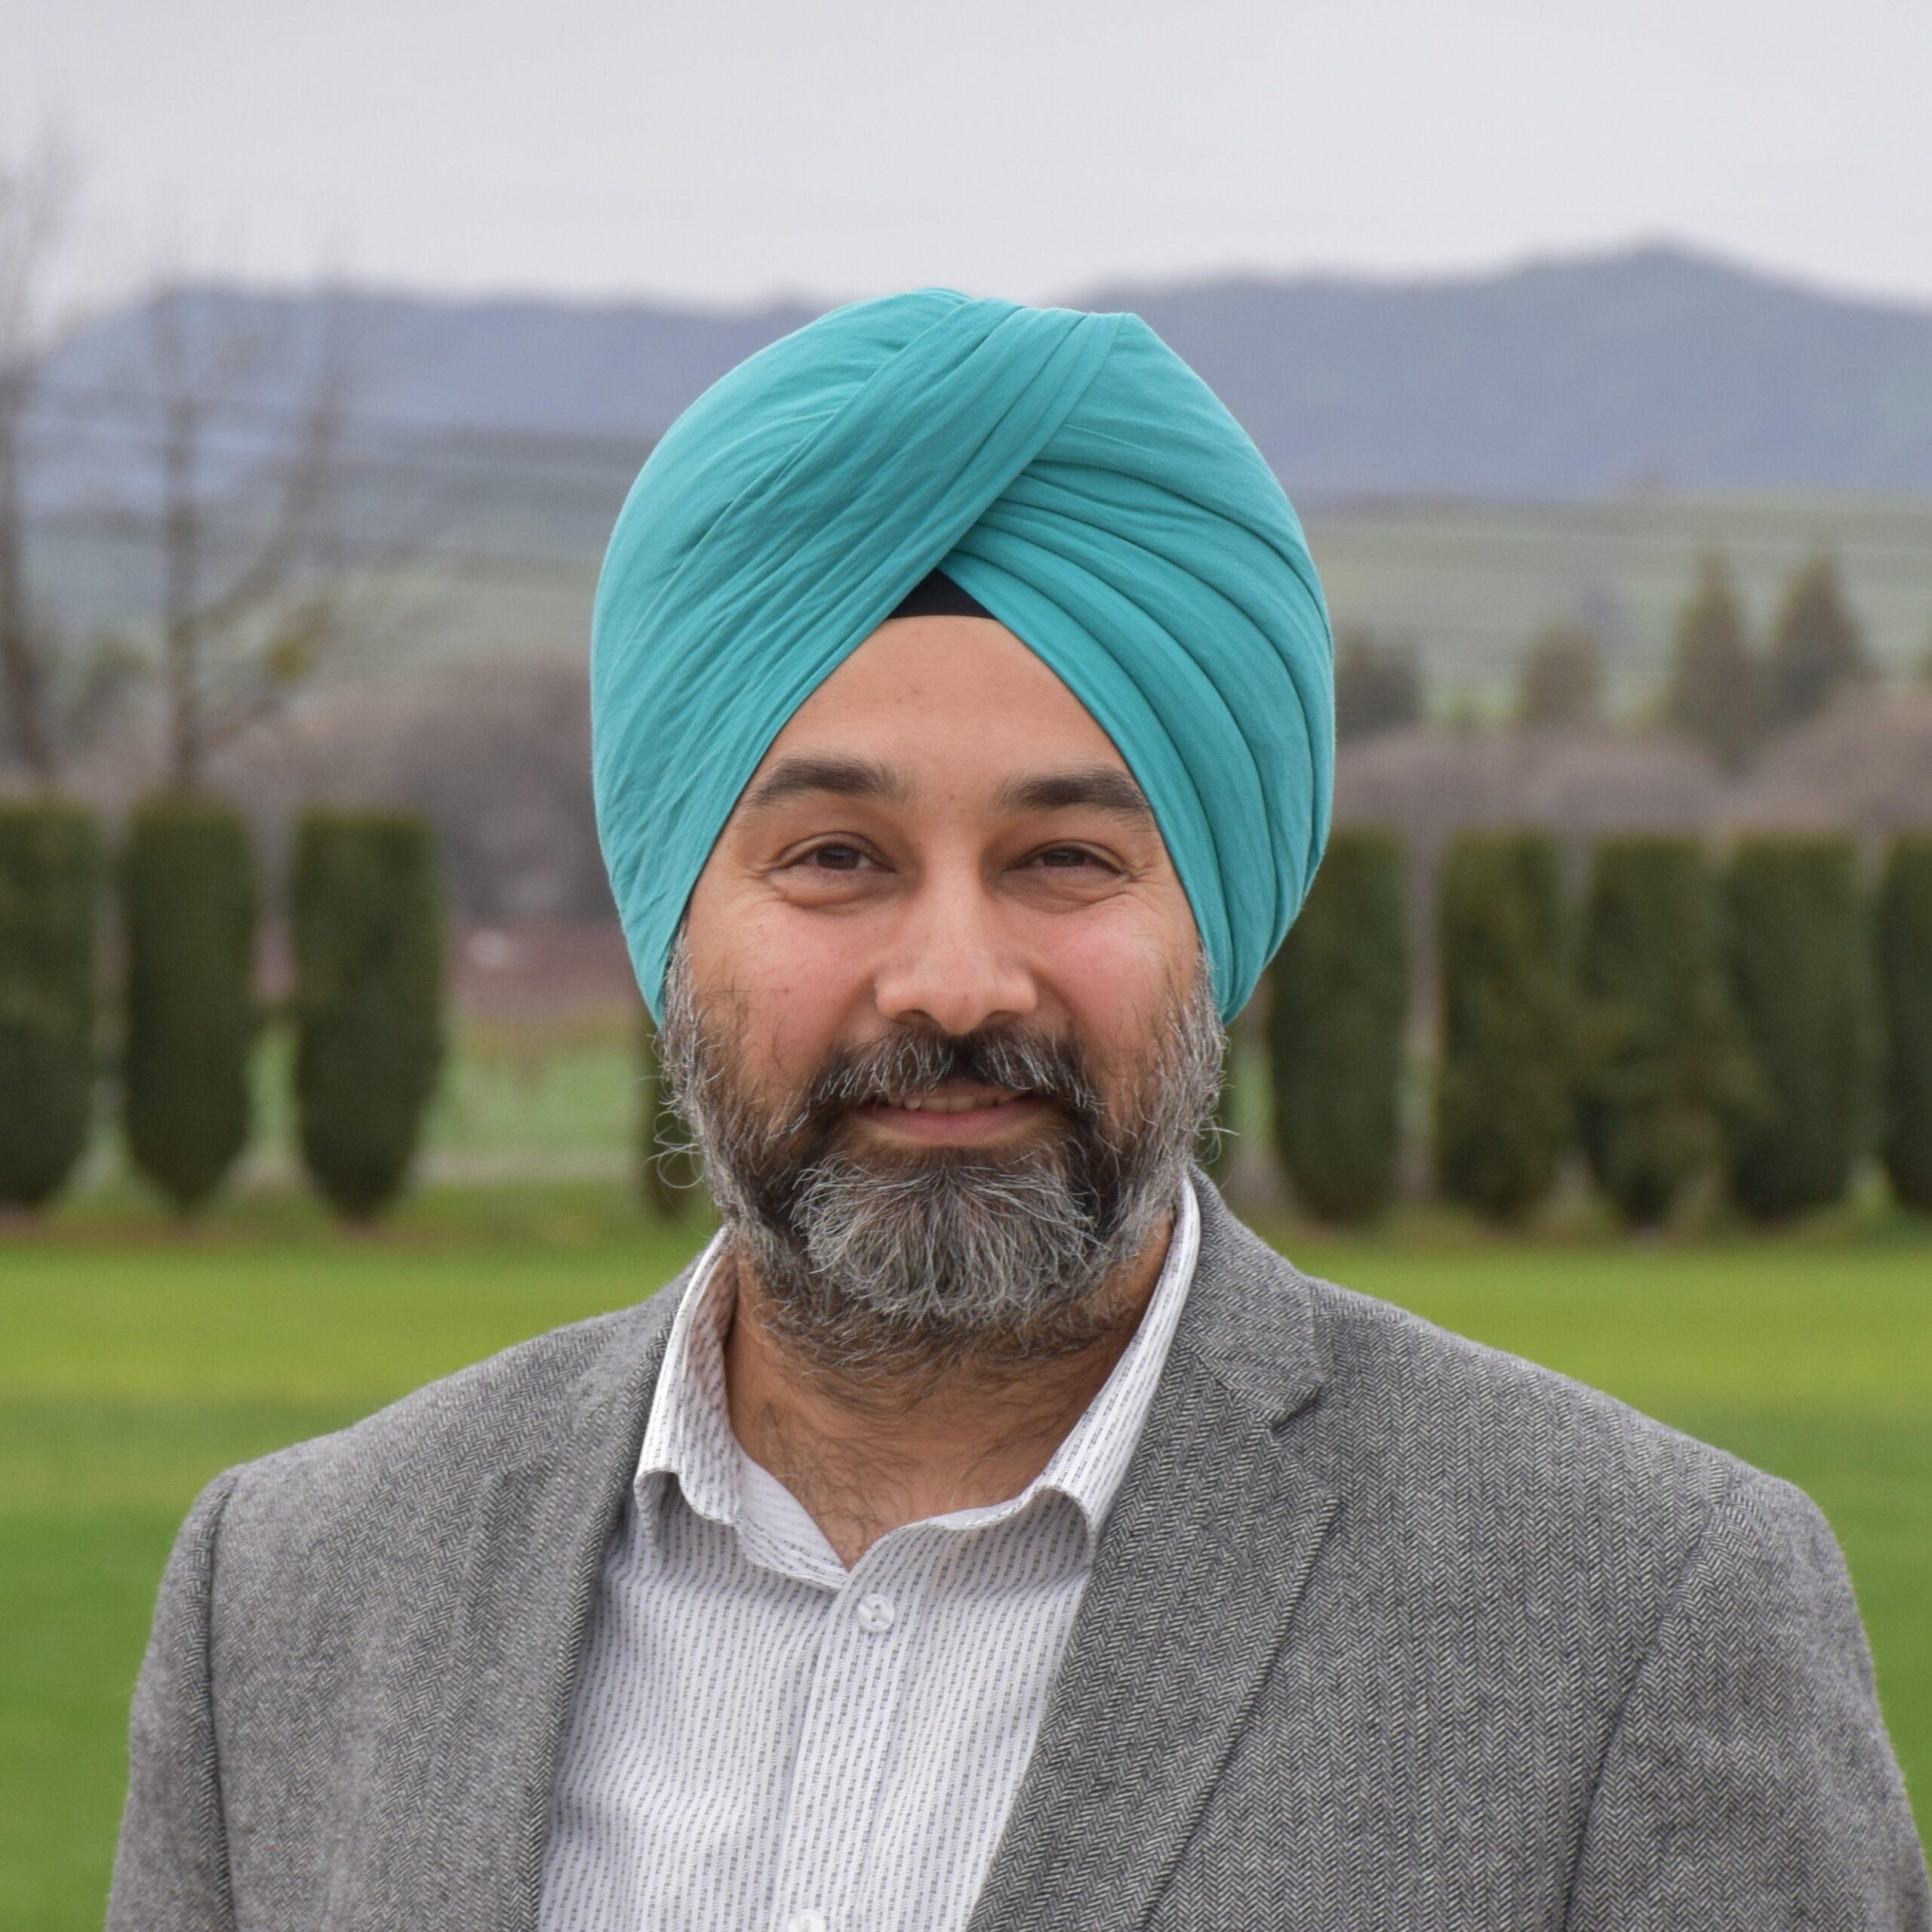 Parminder Singh Bedi